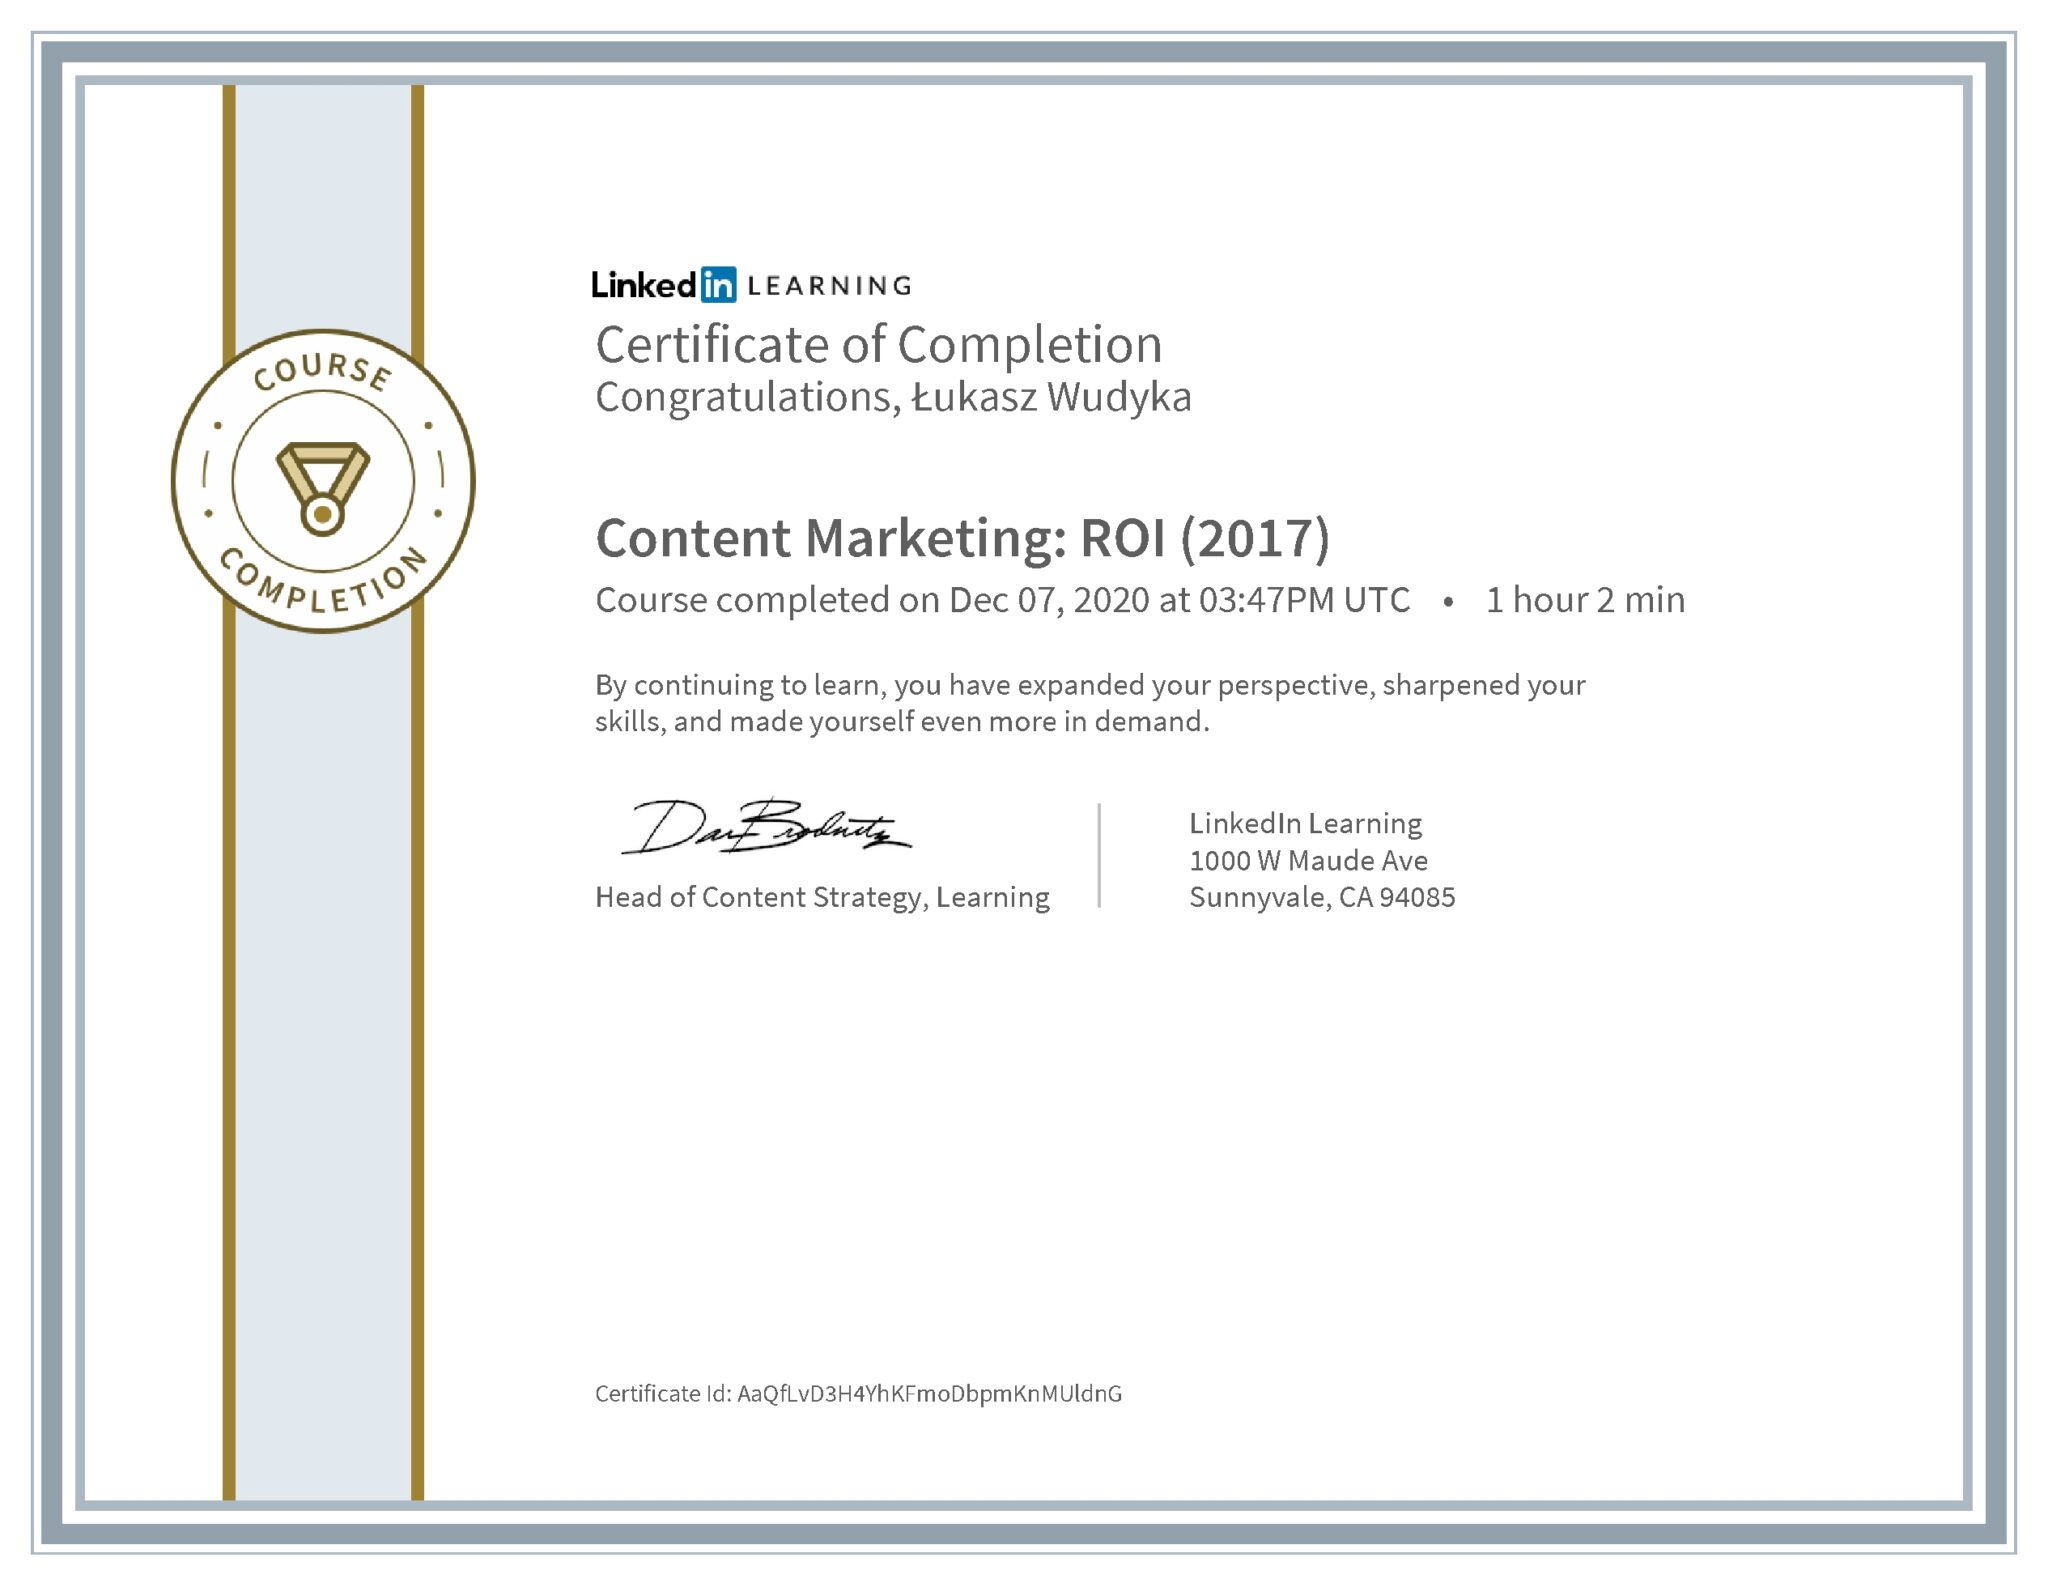 Łukasz Wudyka certyfikat LinkedIn Content Marketing: ROI (2017)